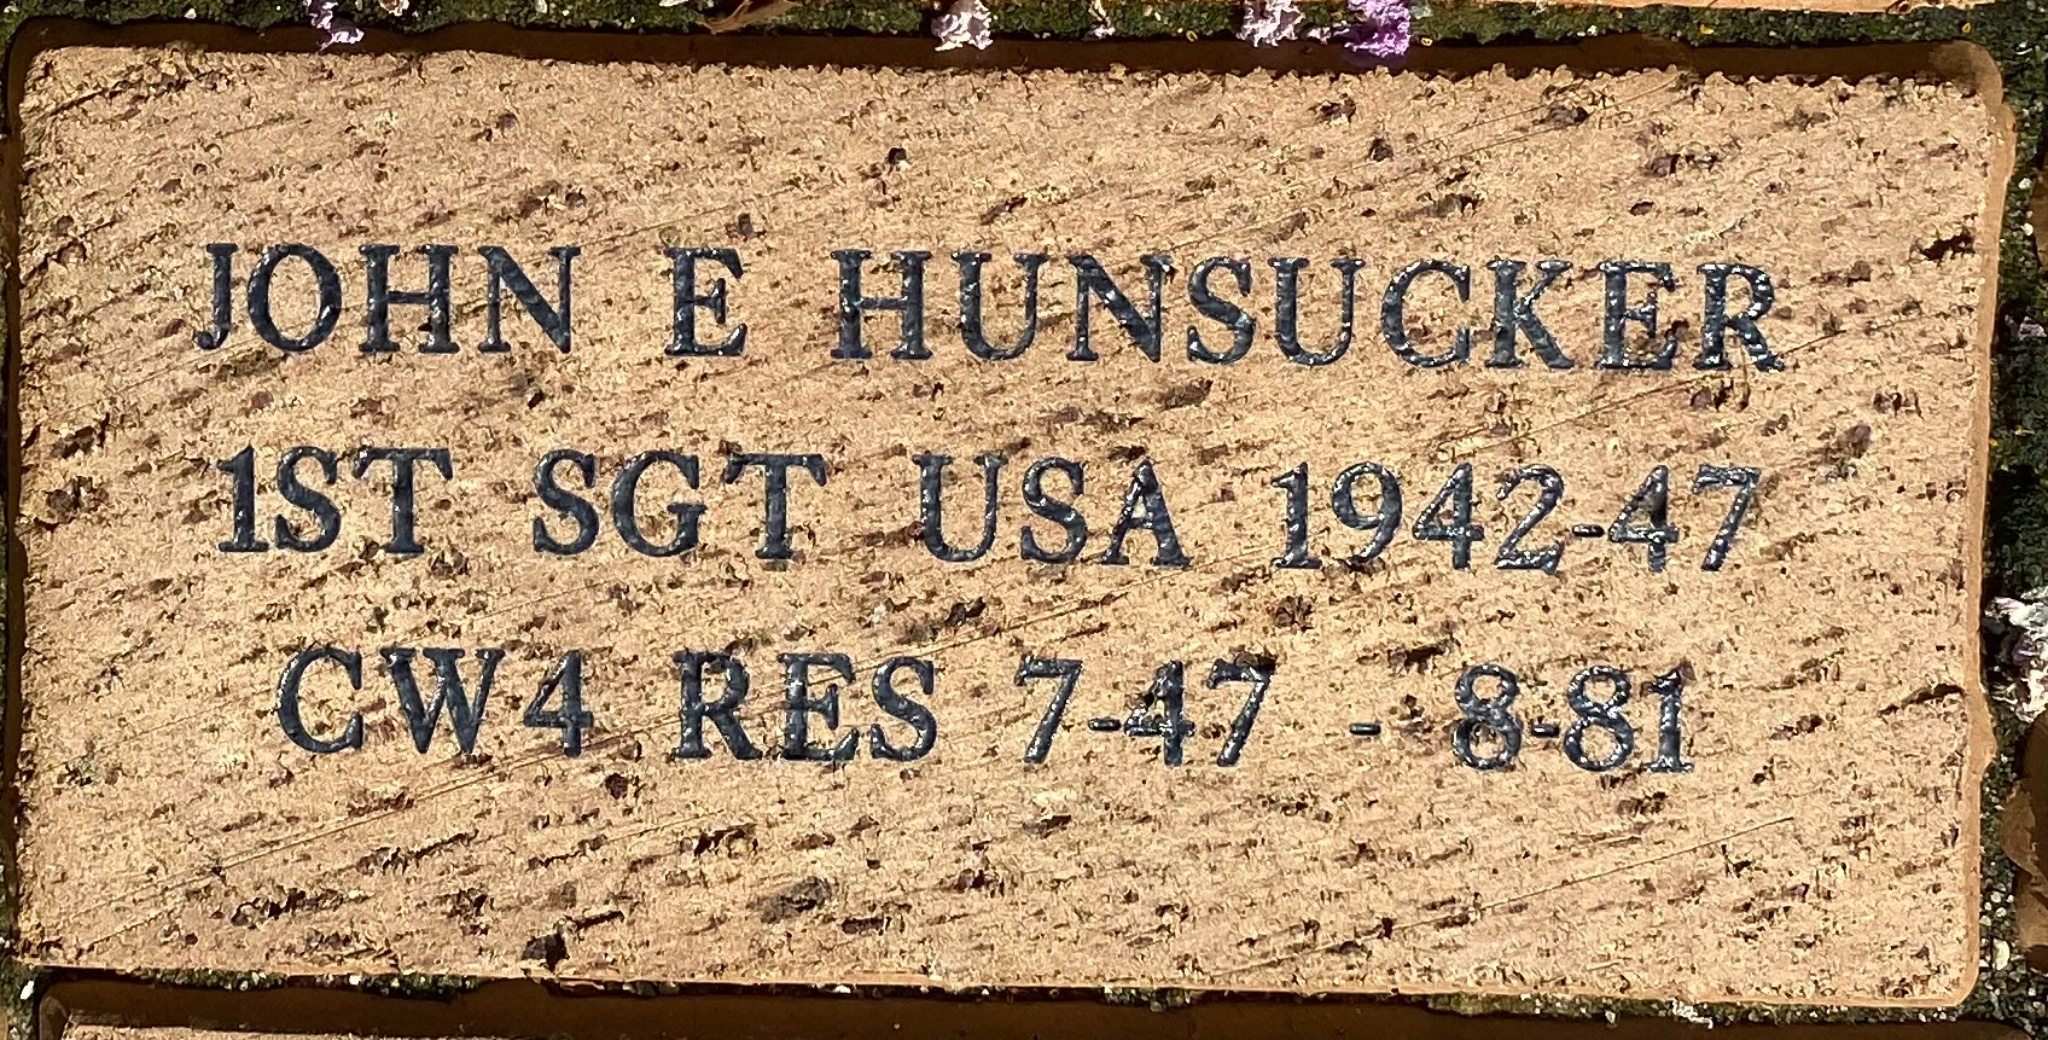 JOHN E HUNSUCKER 1ST SGT USA 1942-47 CW4 RES 7-47 – 8-81